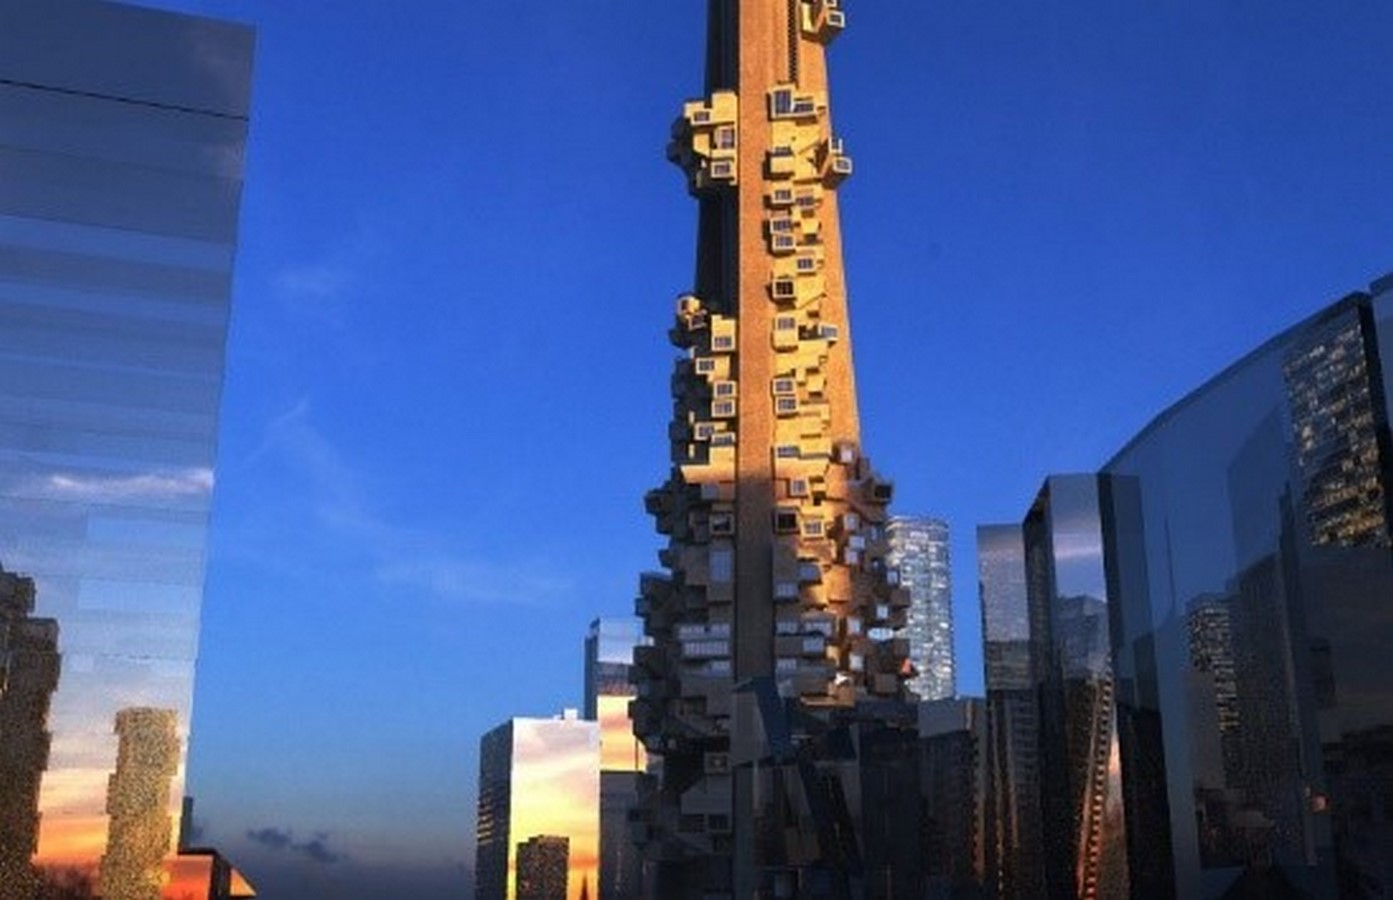 Parasitic CN Tower, Canada - Sheet1